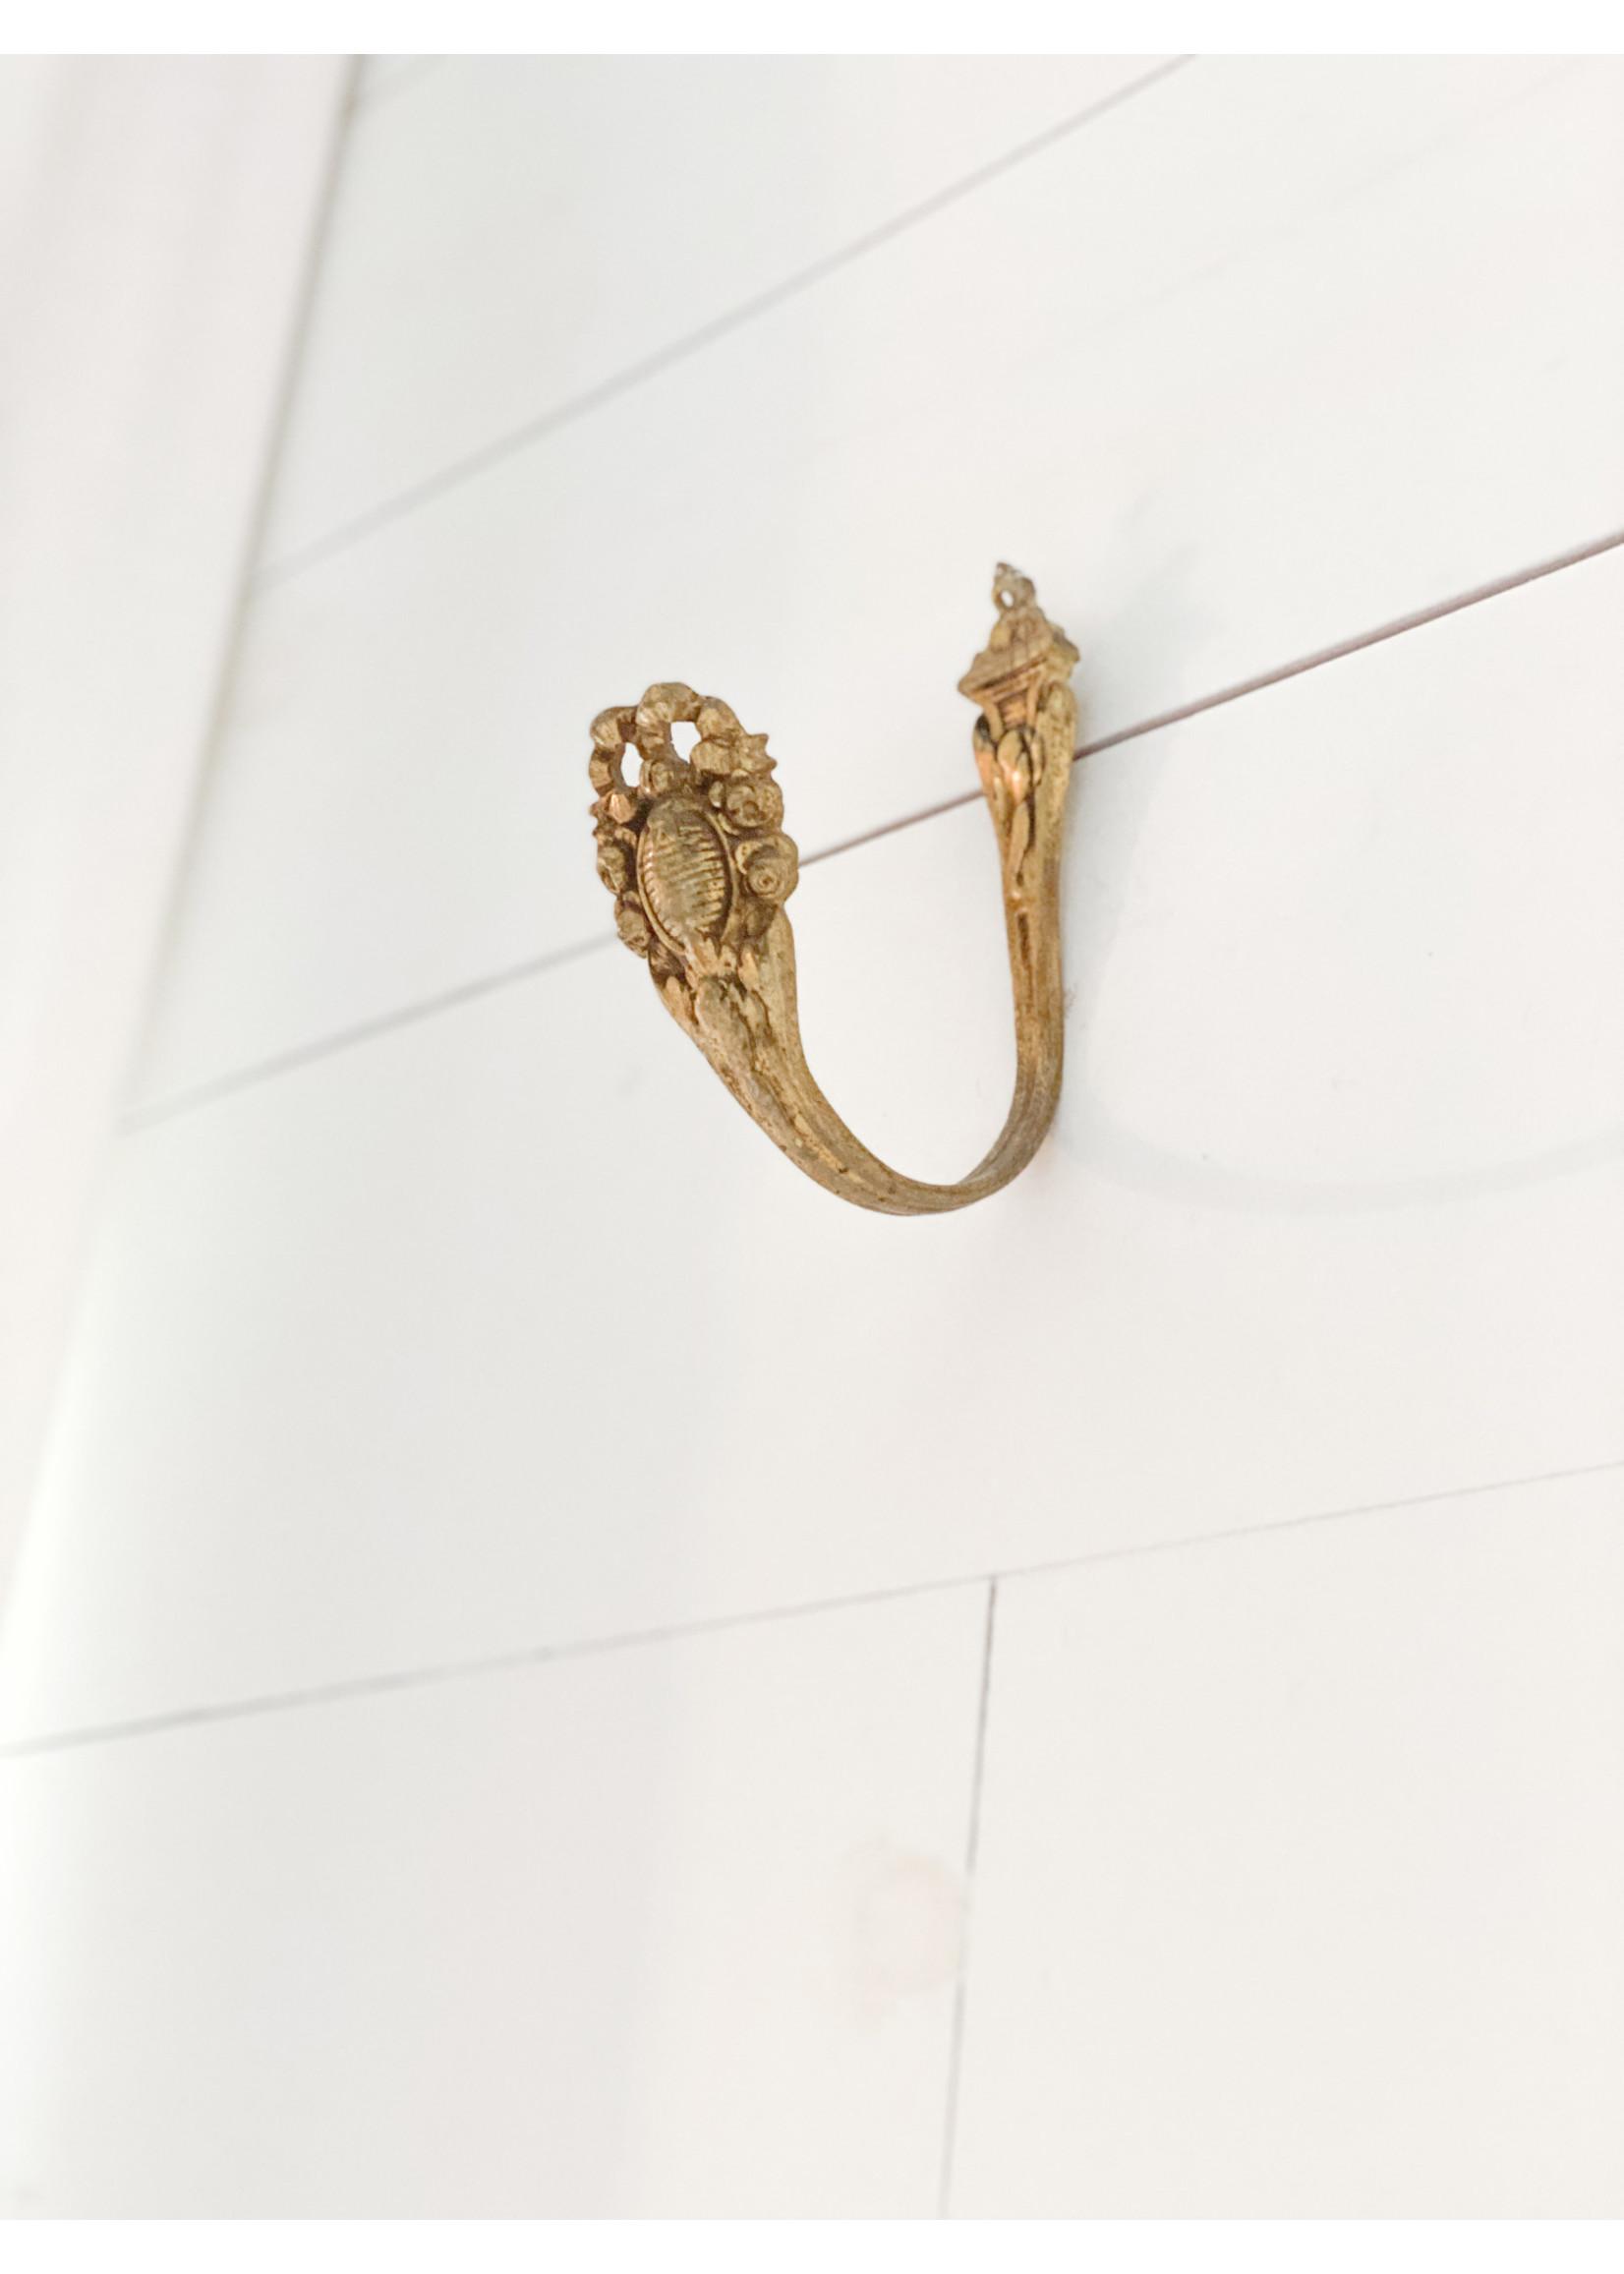 Antique Antique Curtain Pull Back/Hook (pair)